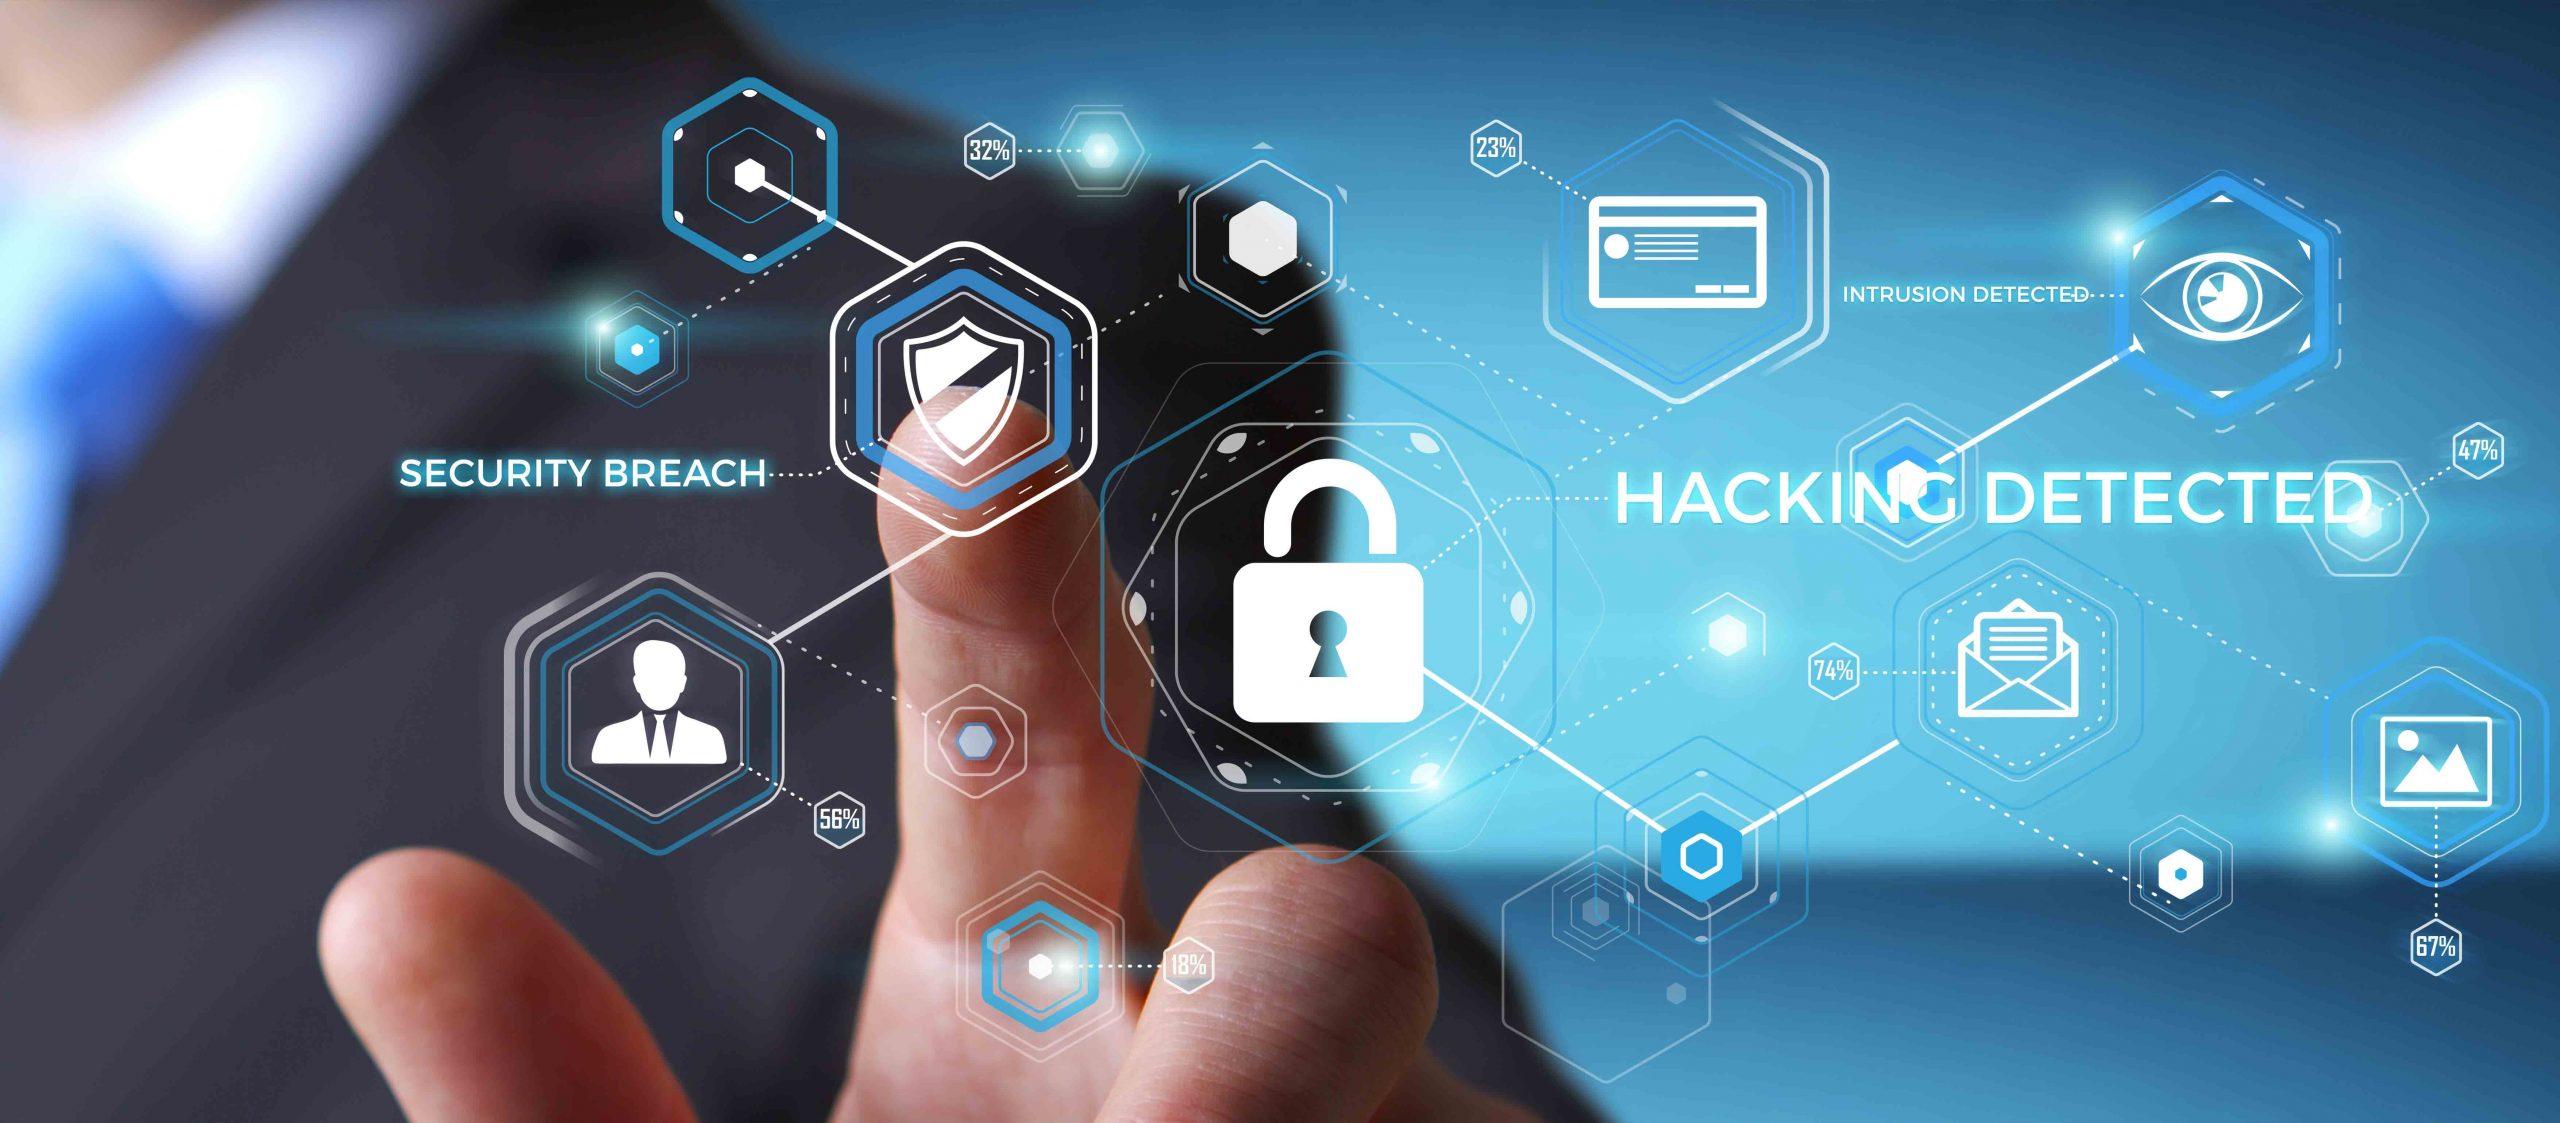 ONCIBER ciberseguridad